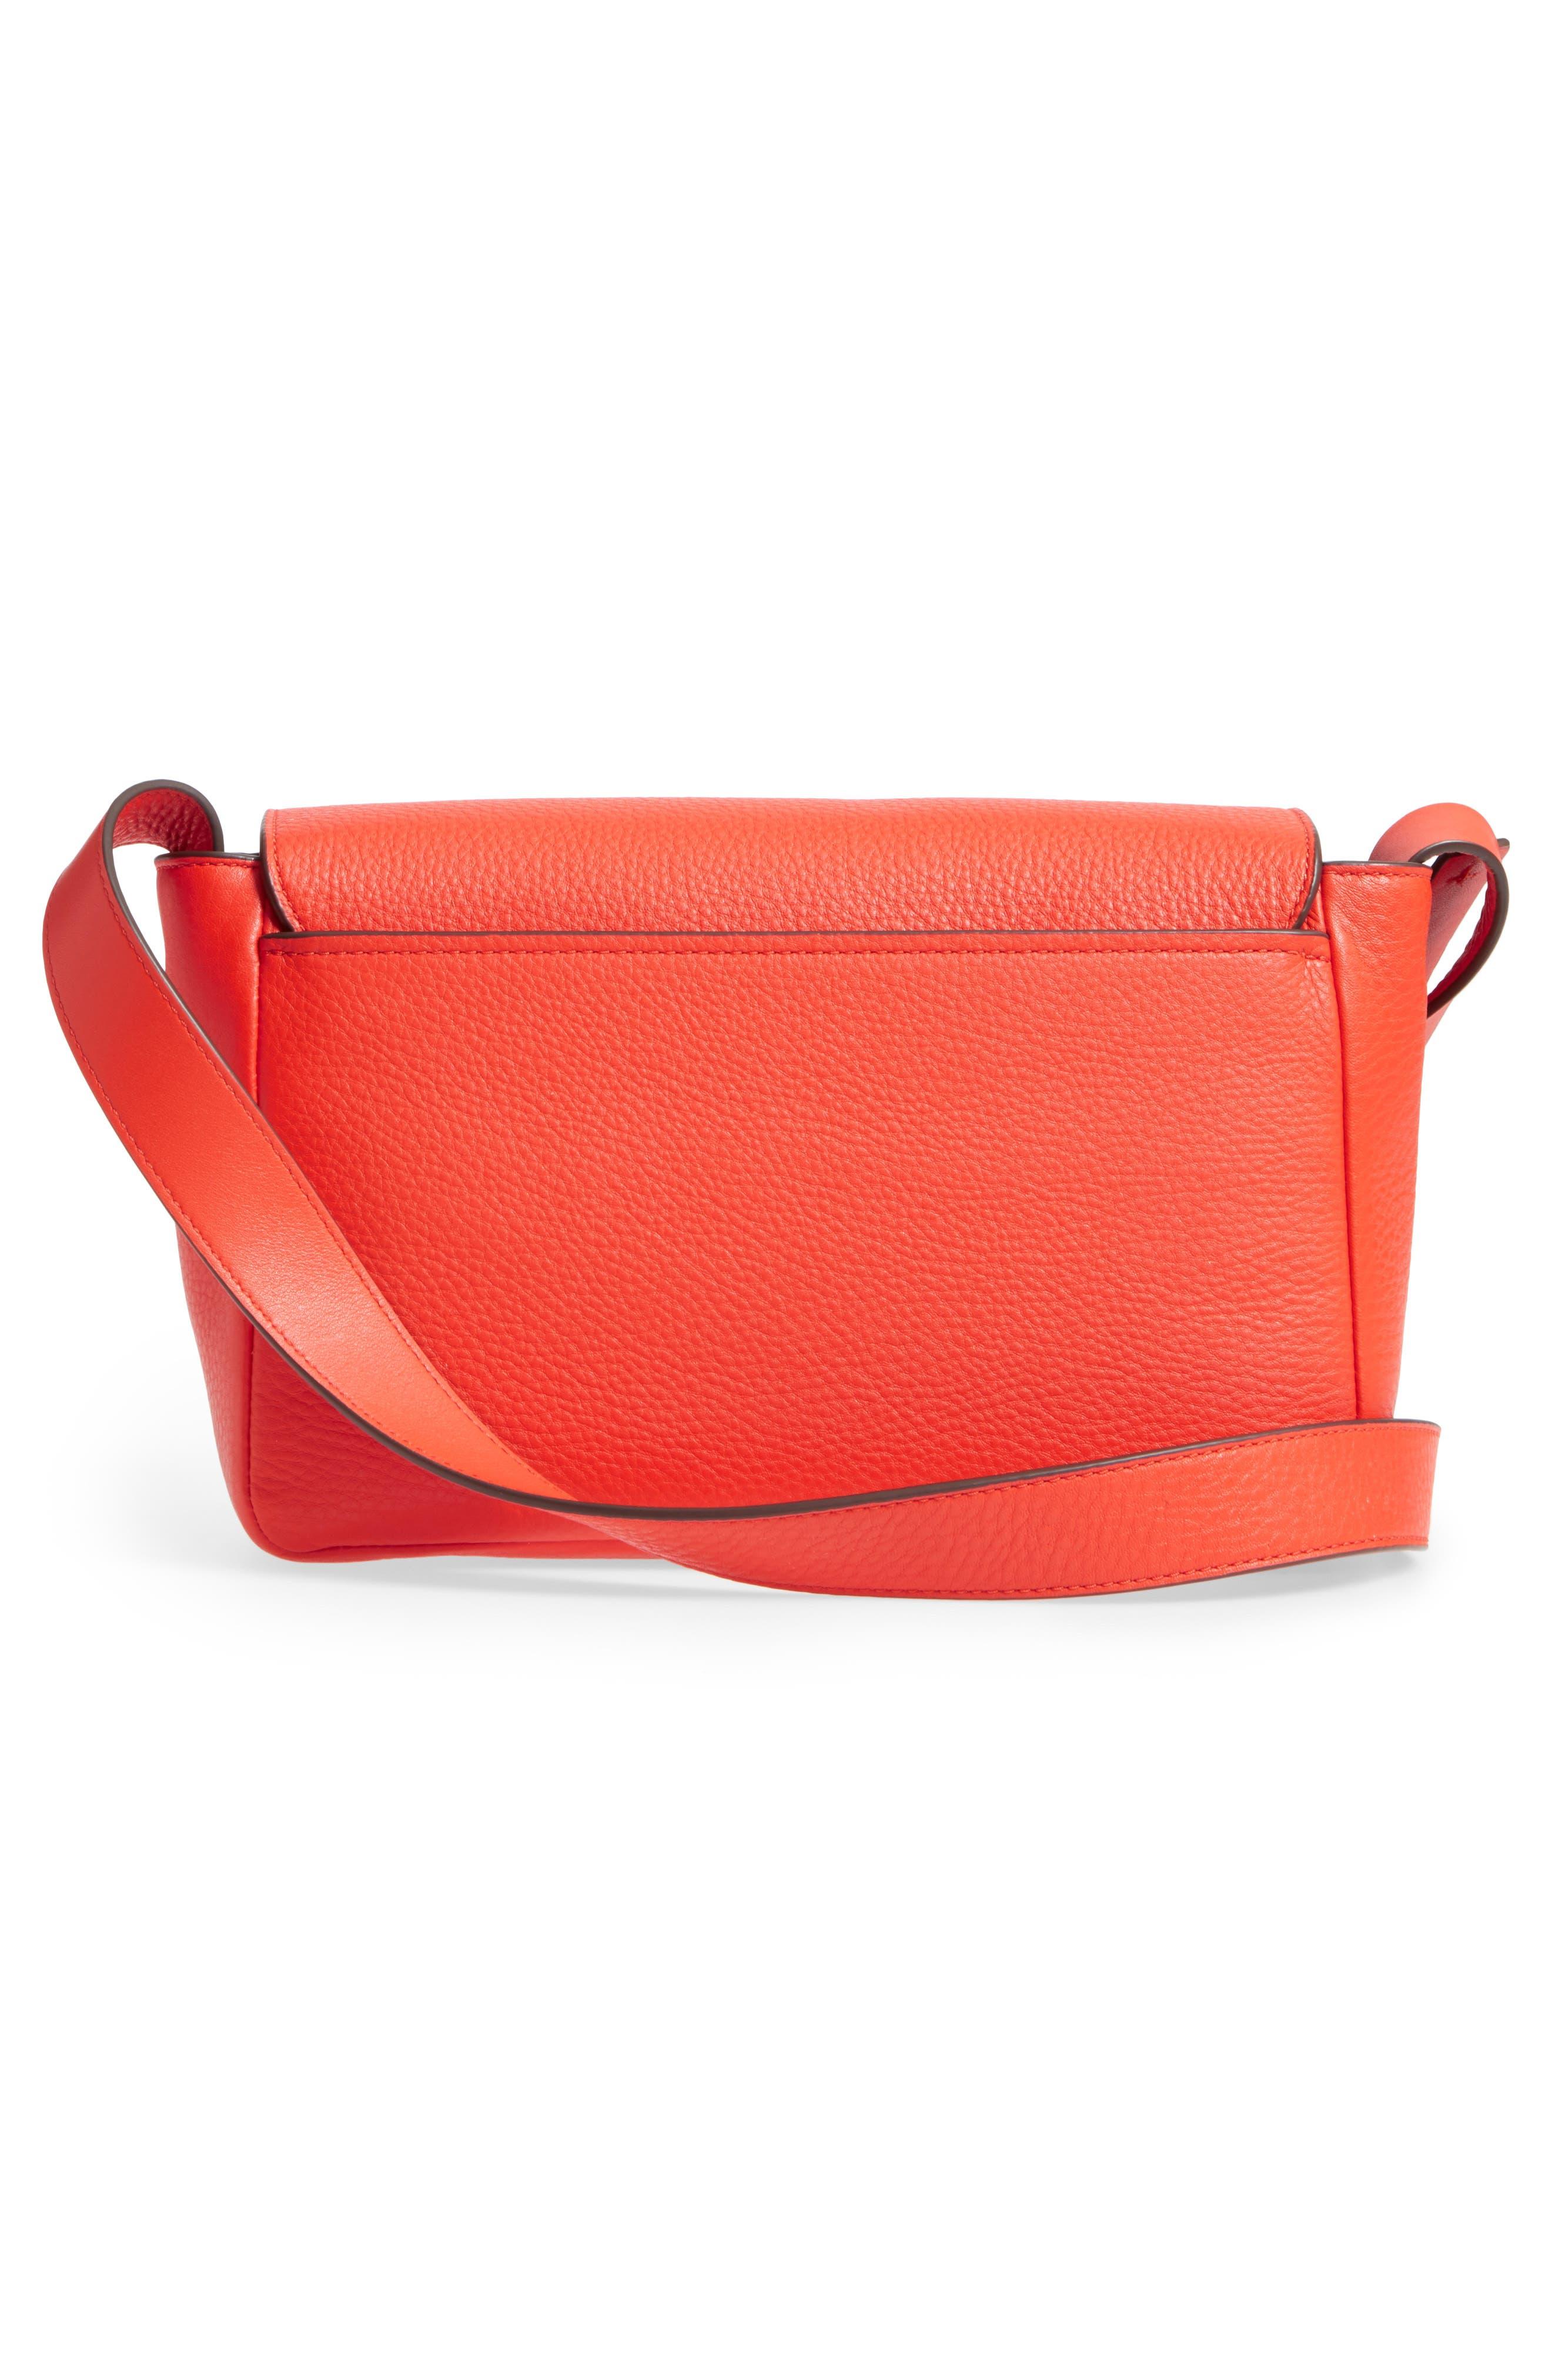 Block-T Pebbled Leather Shoulder Bag,                             Alternate thumbnail 3, color,                             Spicy Orange